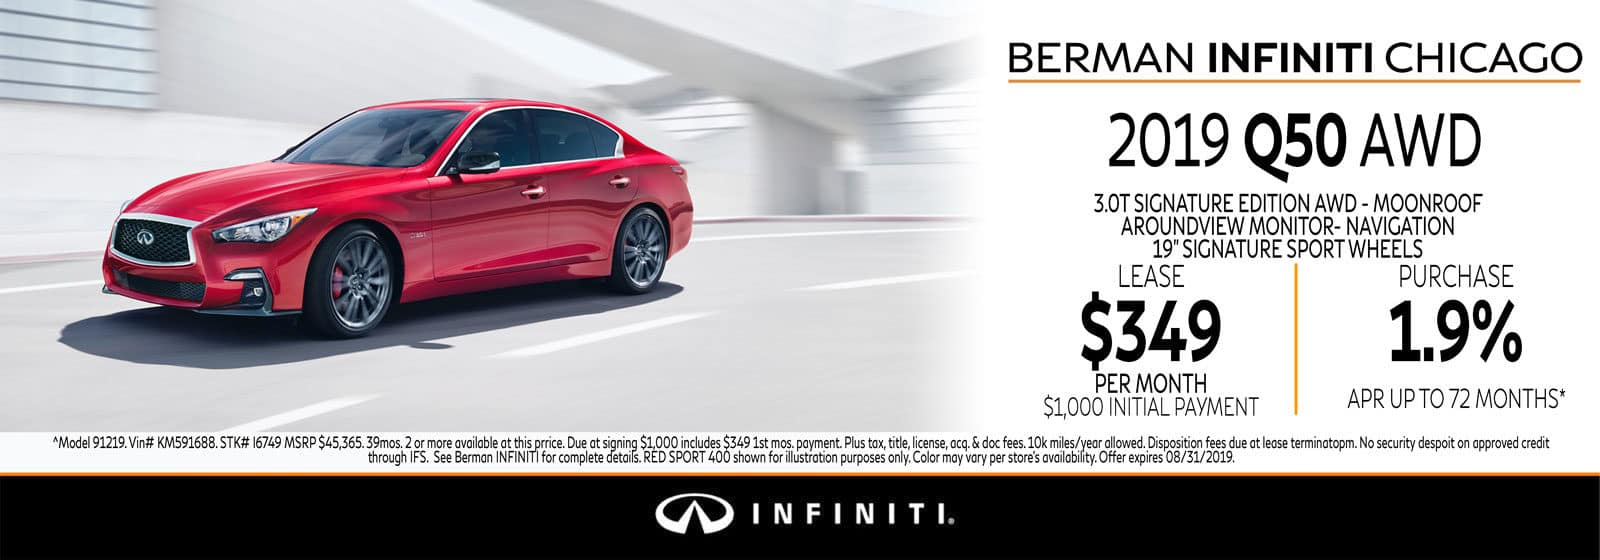 New 2019 INFINITI Q50 August offer at Berman INFINITI Chicago!